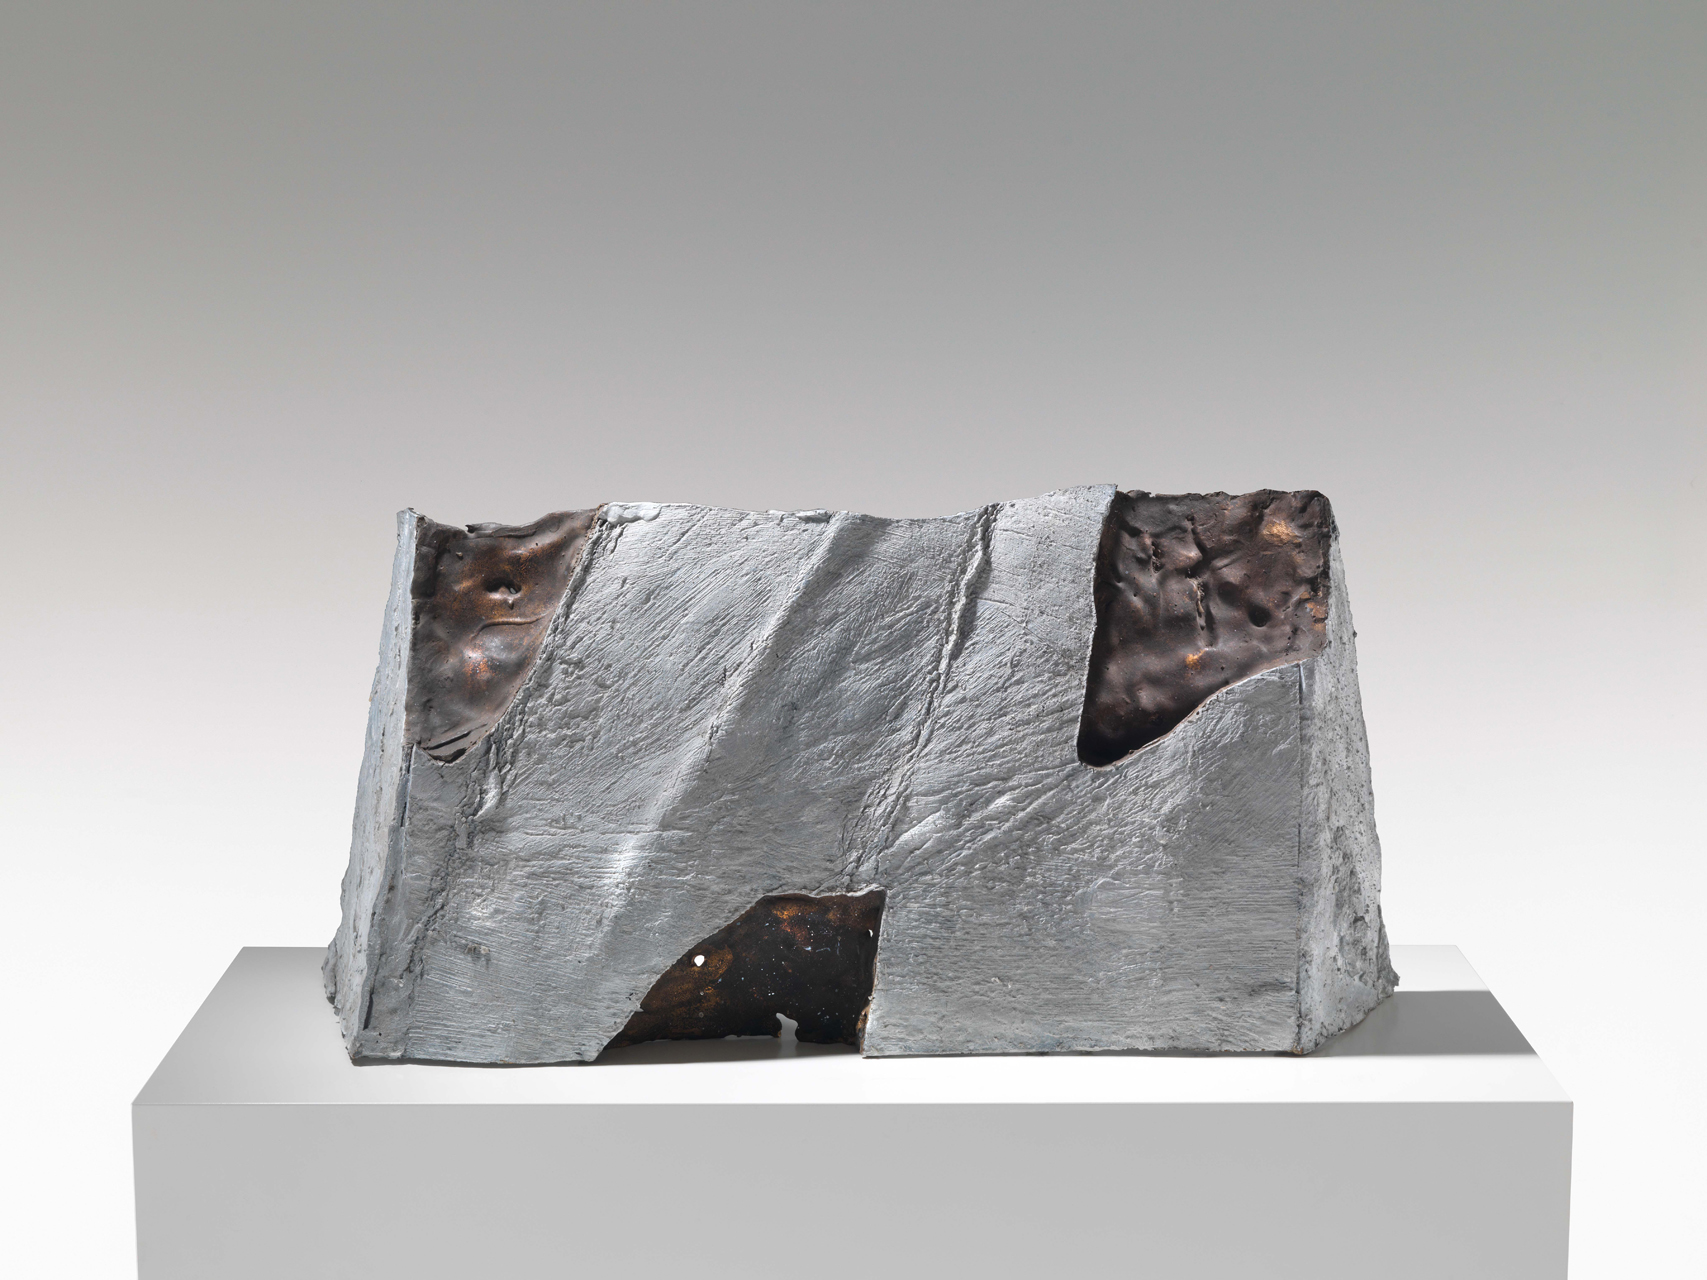 Emil Cimiotti, Schloss Amras, 1992, Bronze, 32 x 68 x 22 cm